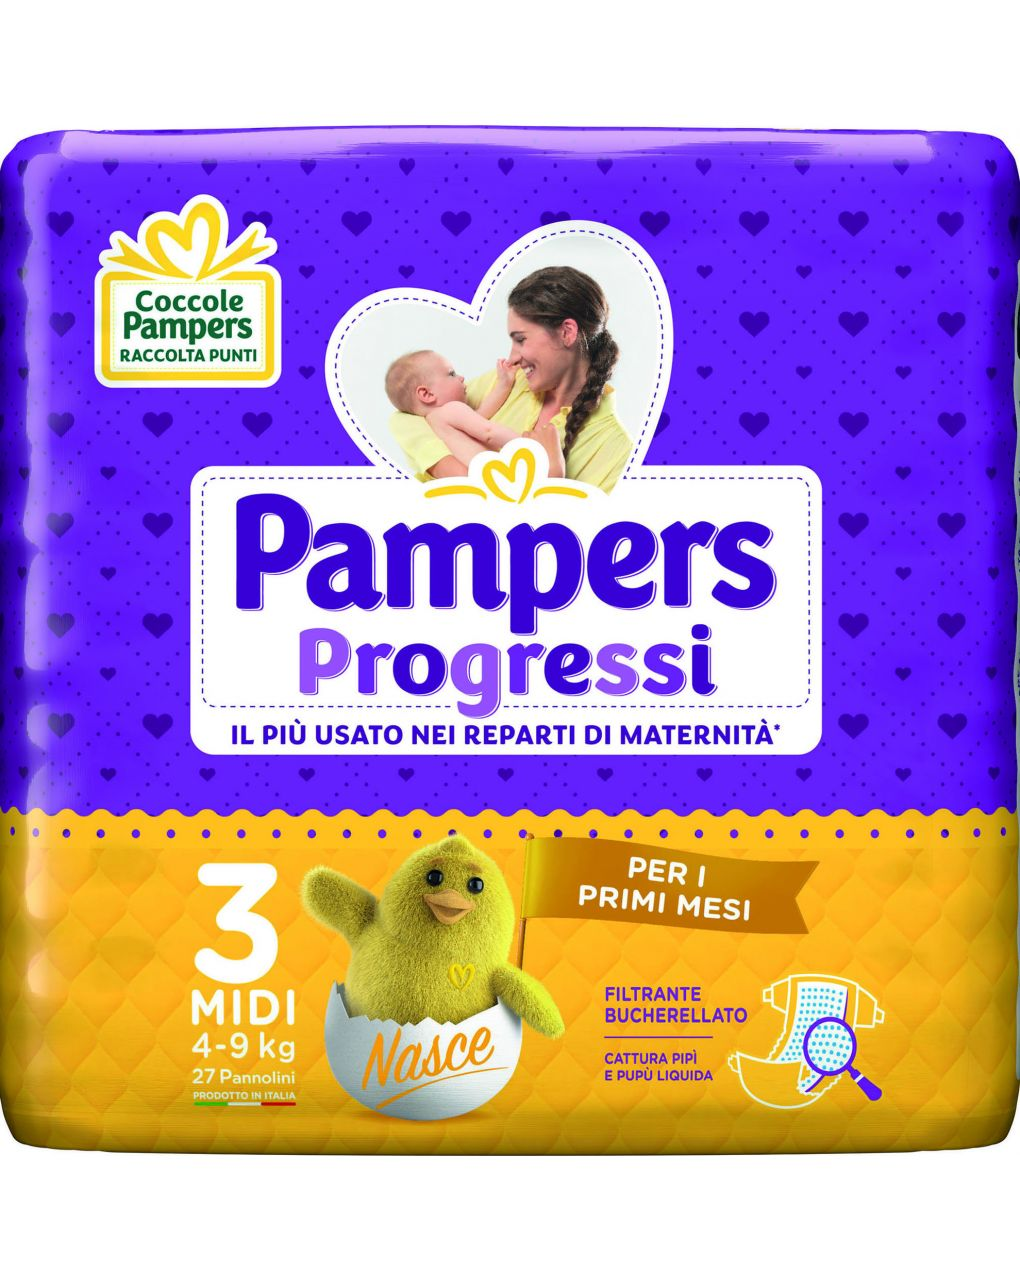 Pampers - pannolini progressi tg. 3 (27 pz) - Pampers